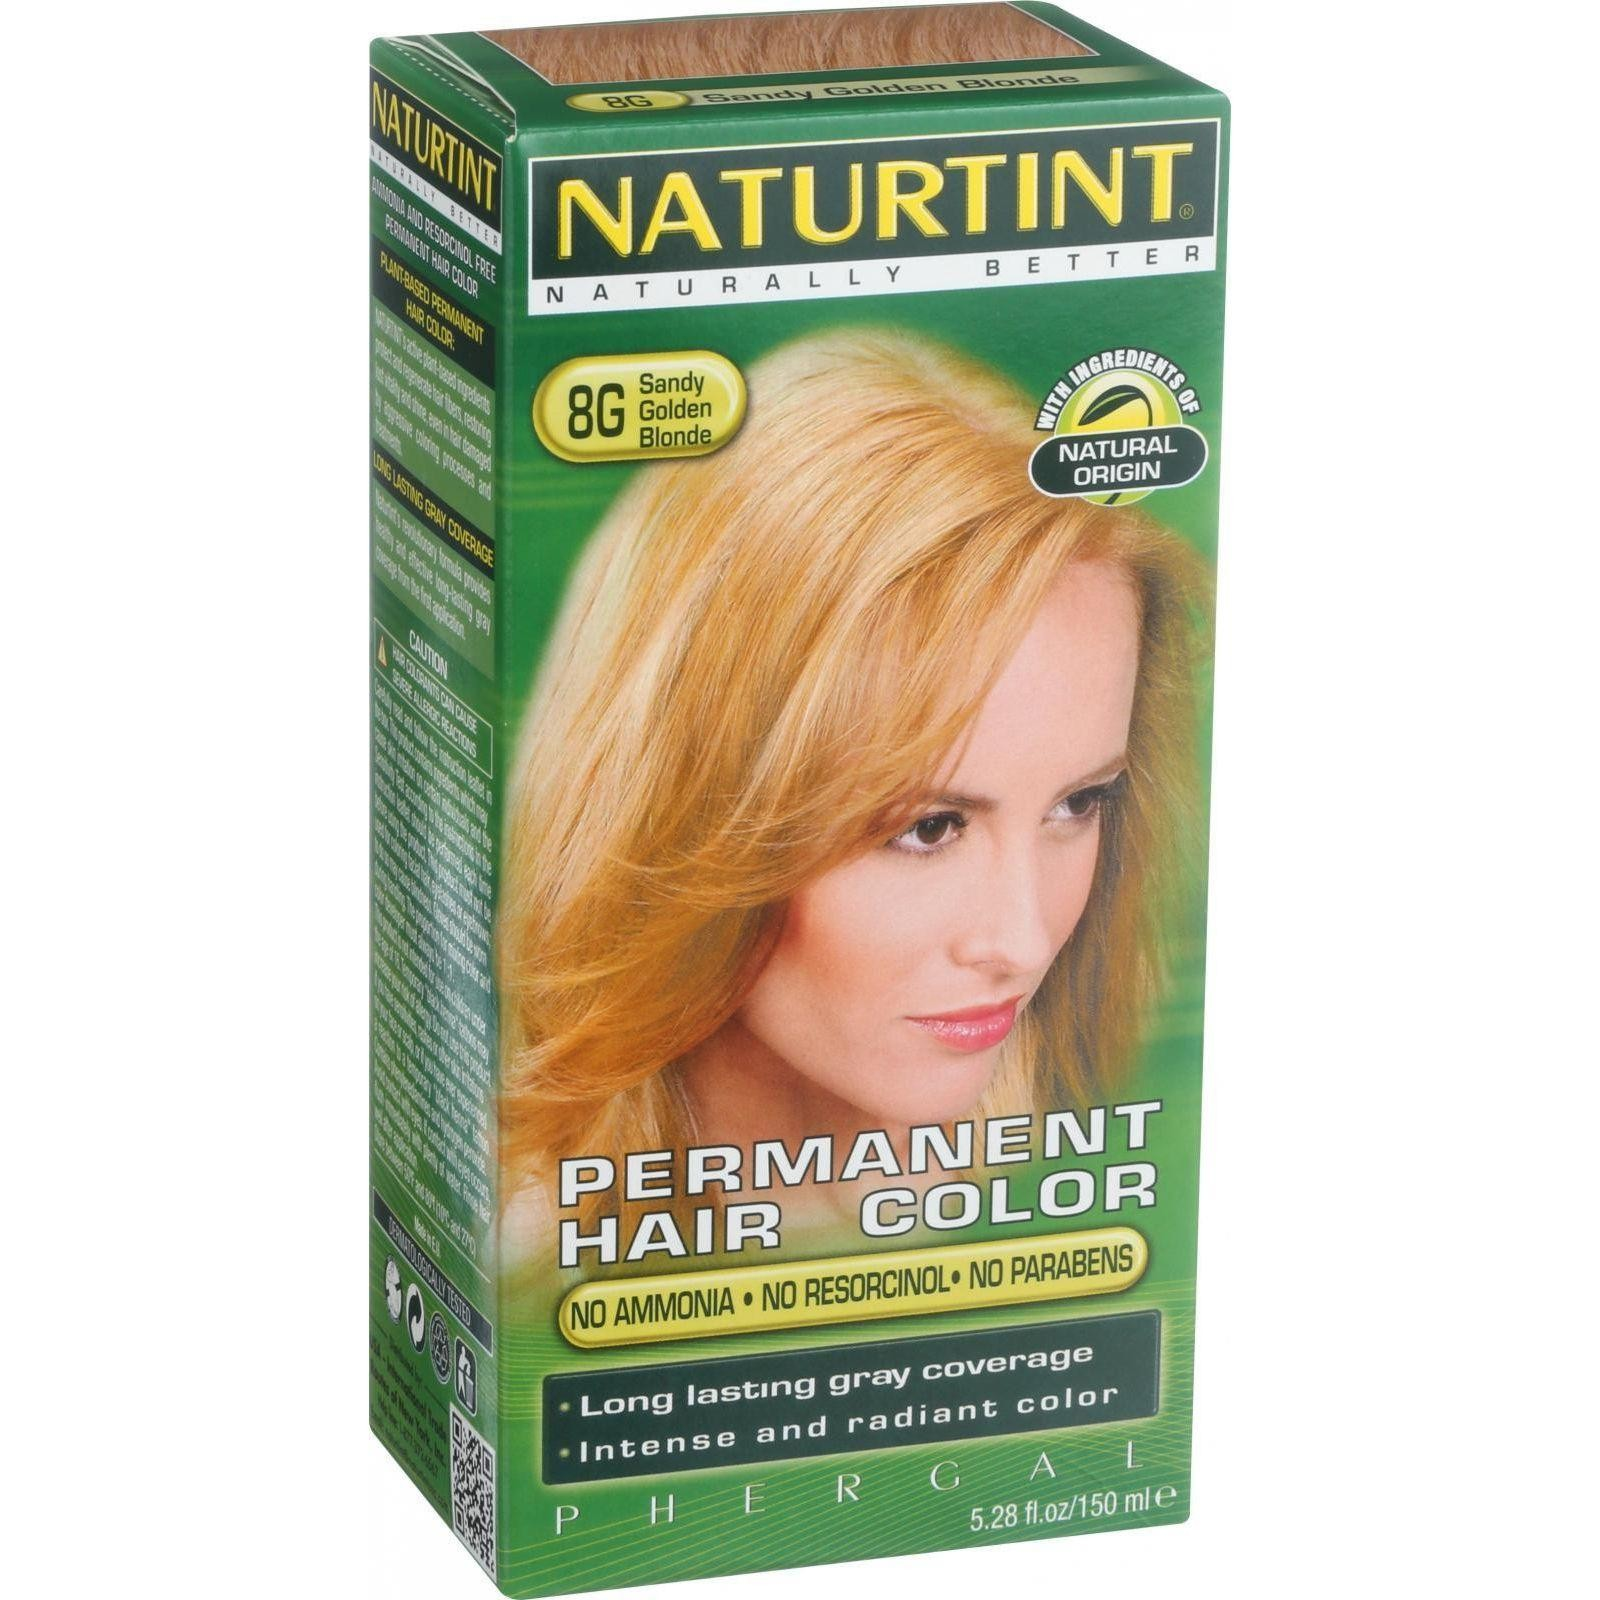 Naturtint Hair Color Permanent 8g Sandy Golden Blonde 528 Oz